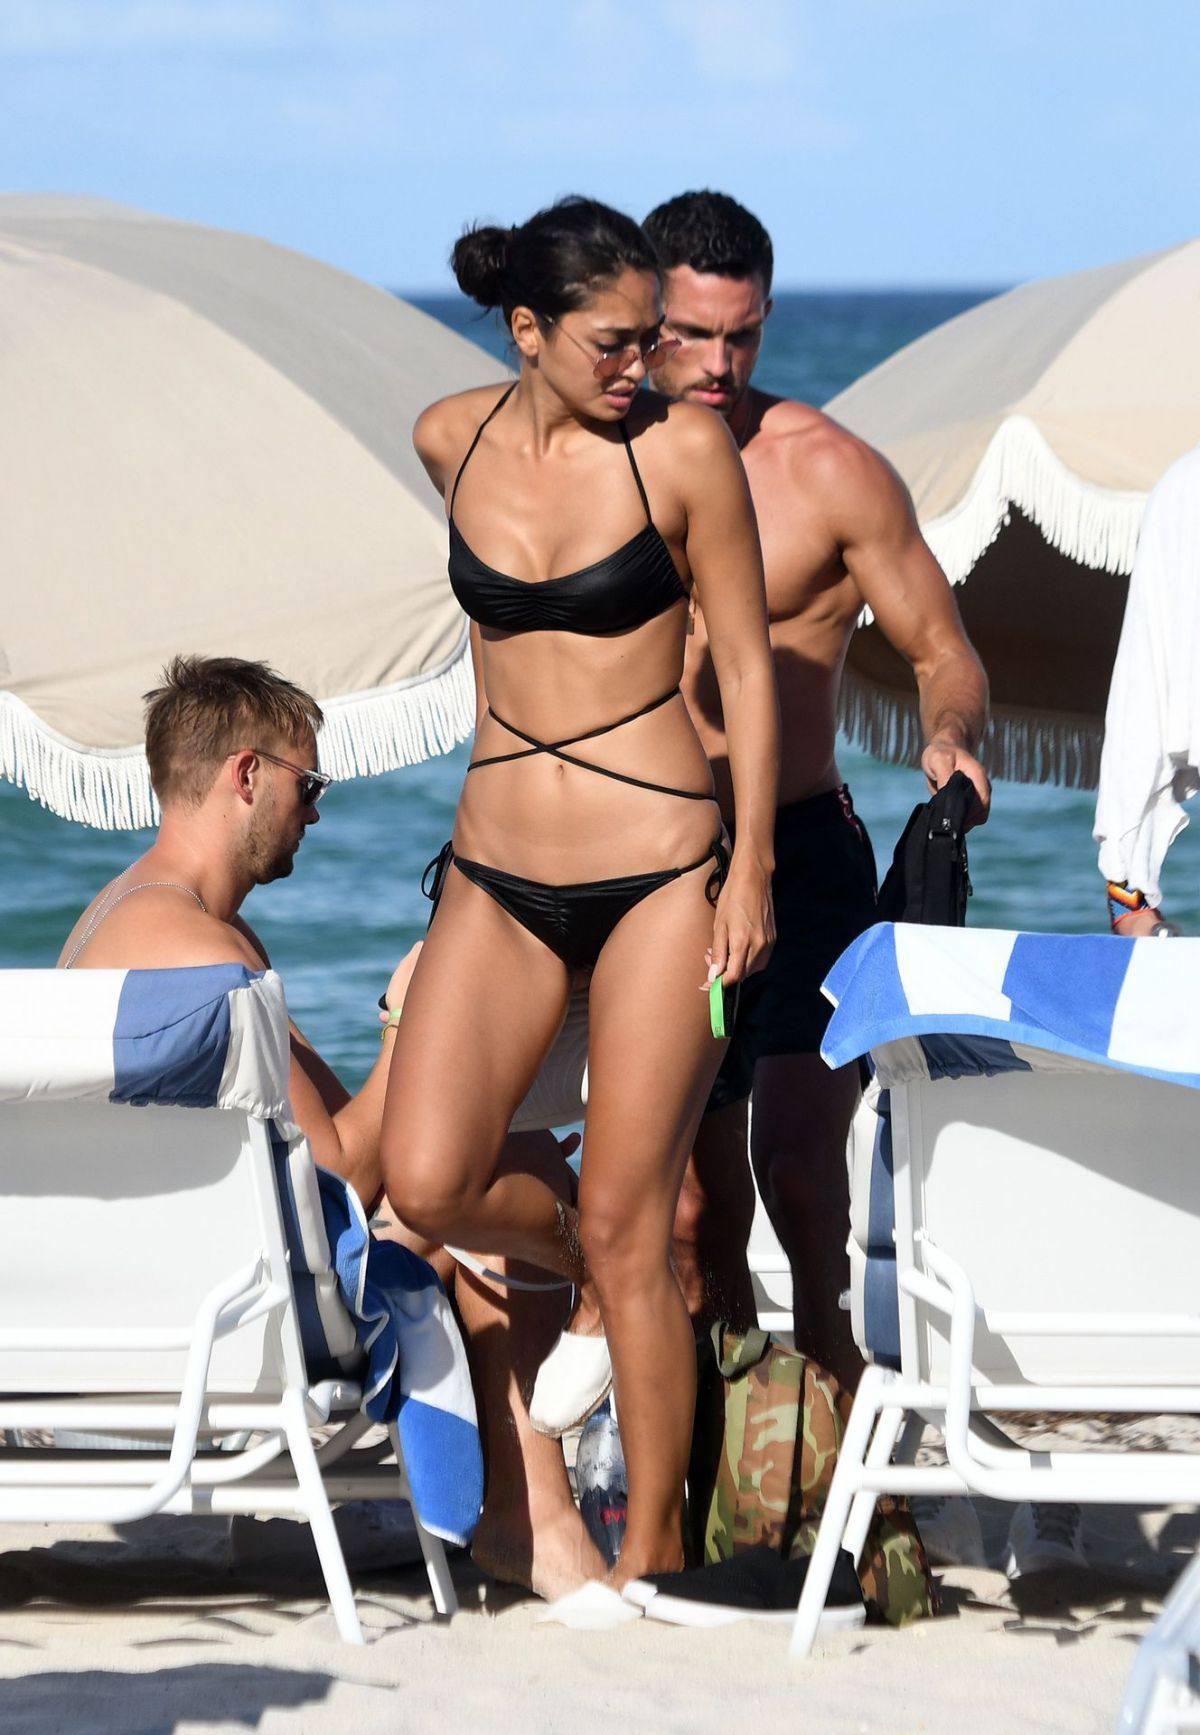 Ambra Gutierrez – Beautiful Body In Small Bikini At The Beach In Miami Beach 0011